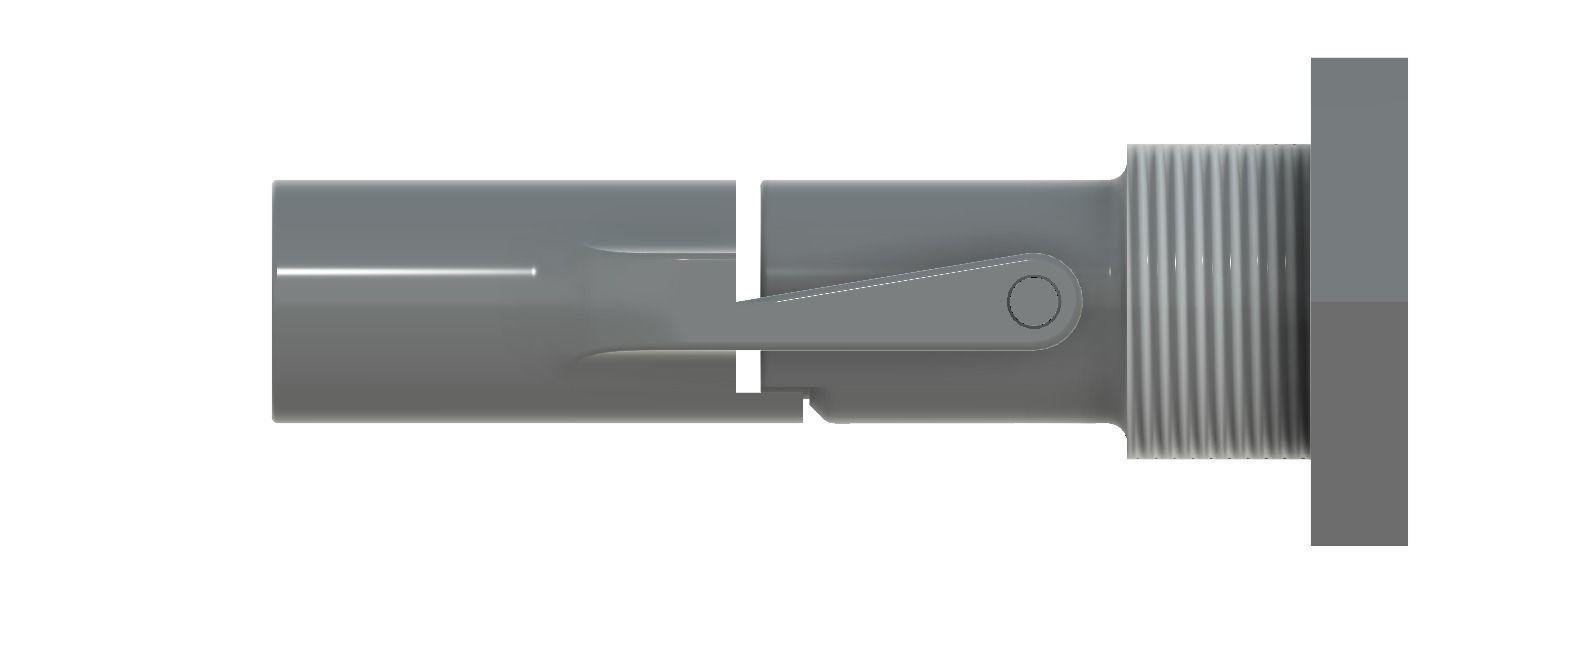 Level Float Switch